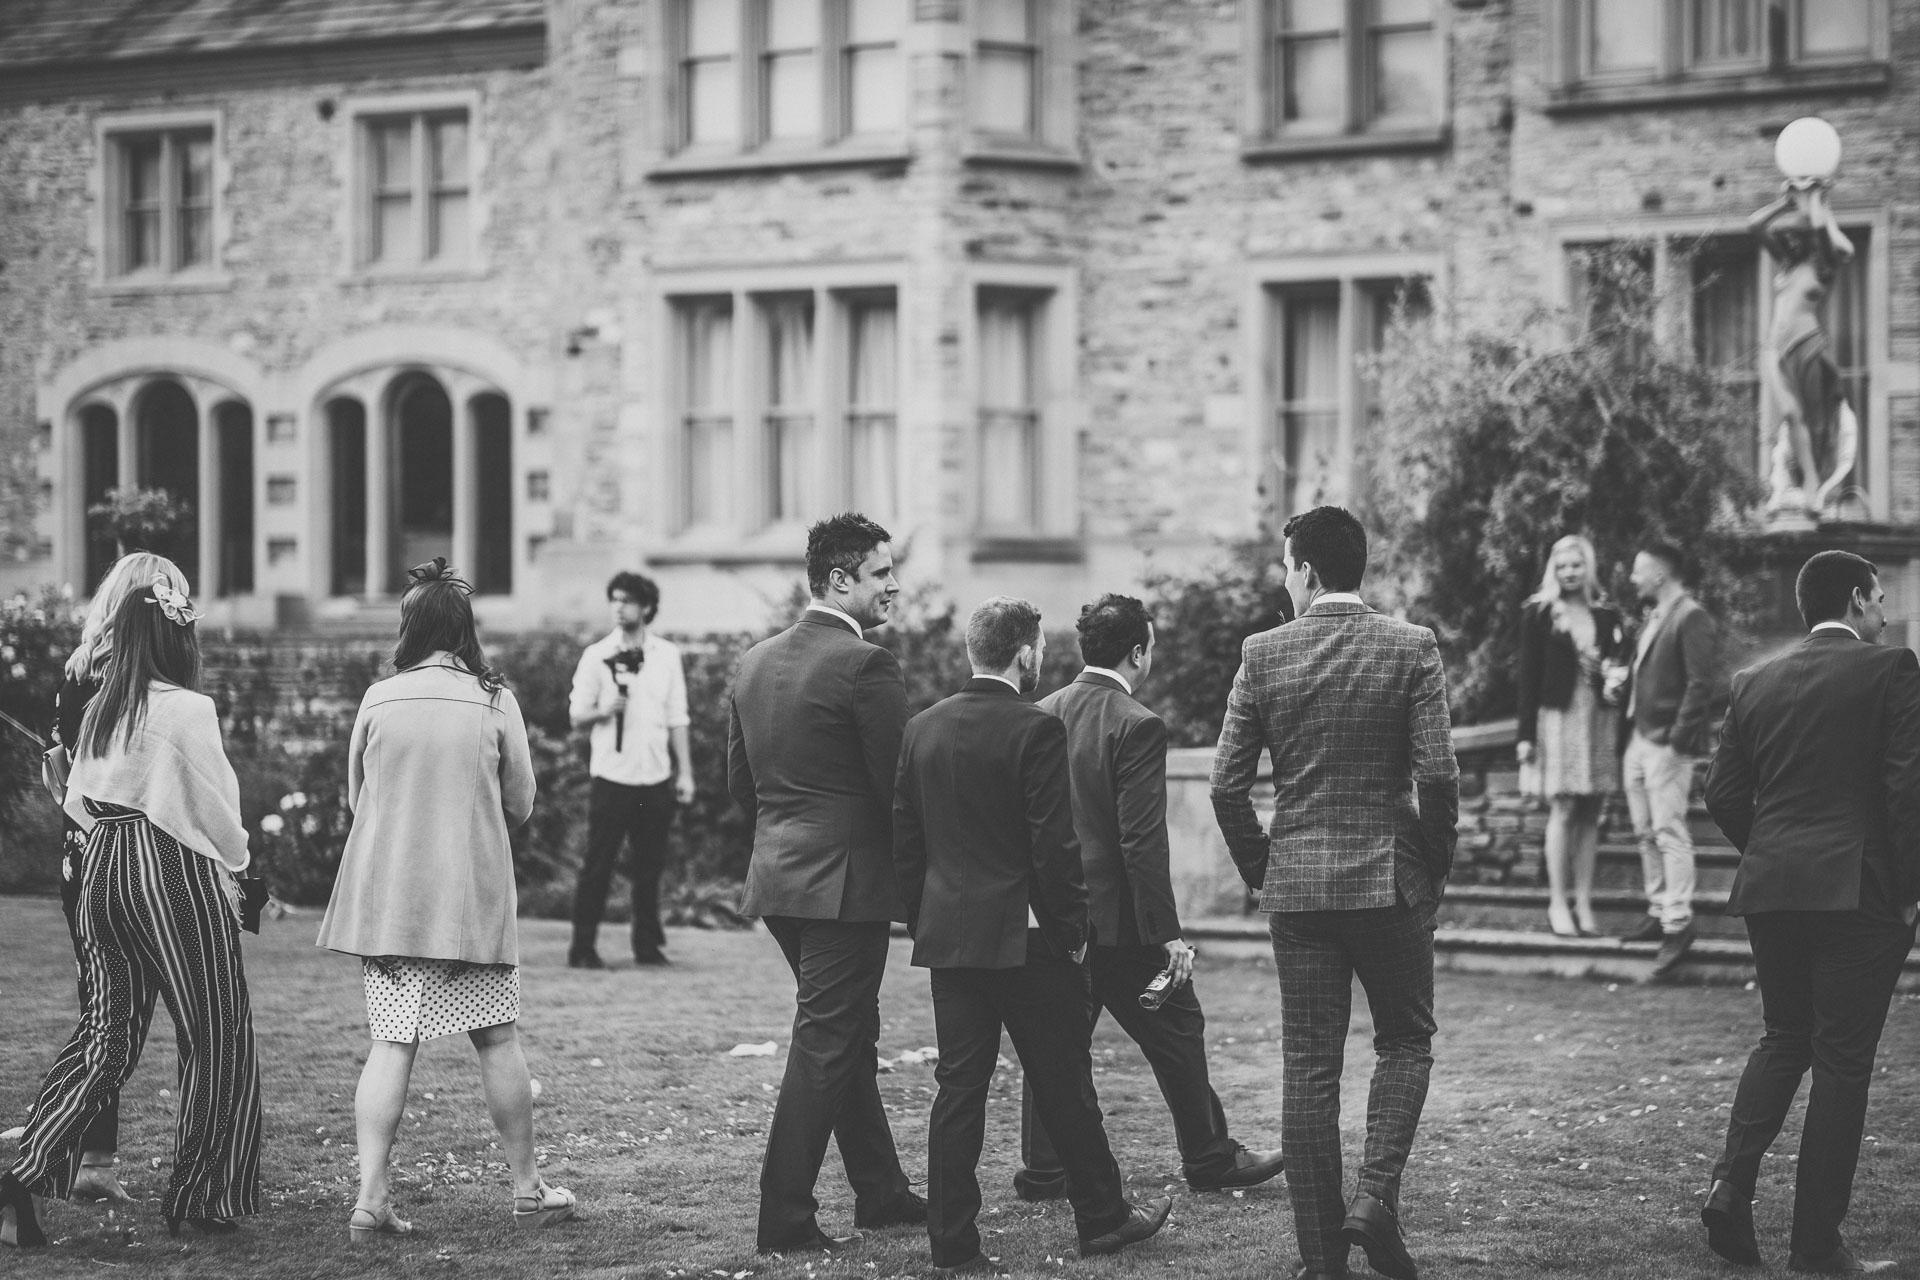 forbidden_corner_tupgill_estate_wedding_photographer-93.jpg